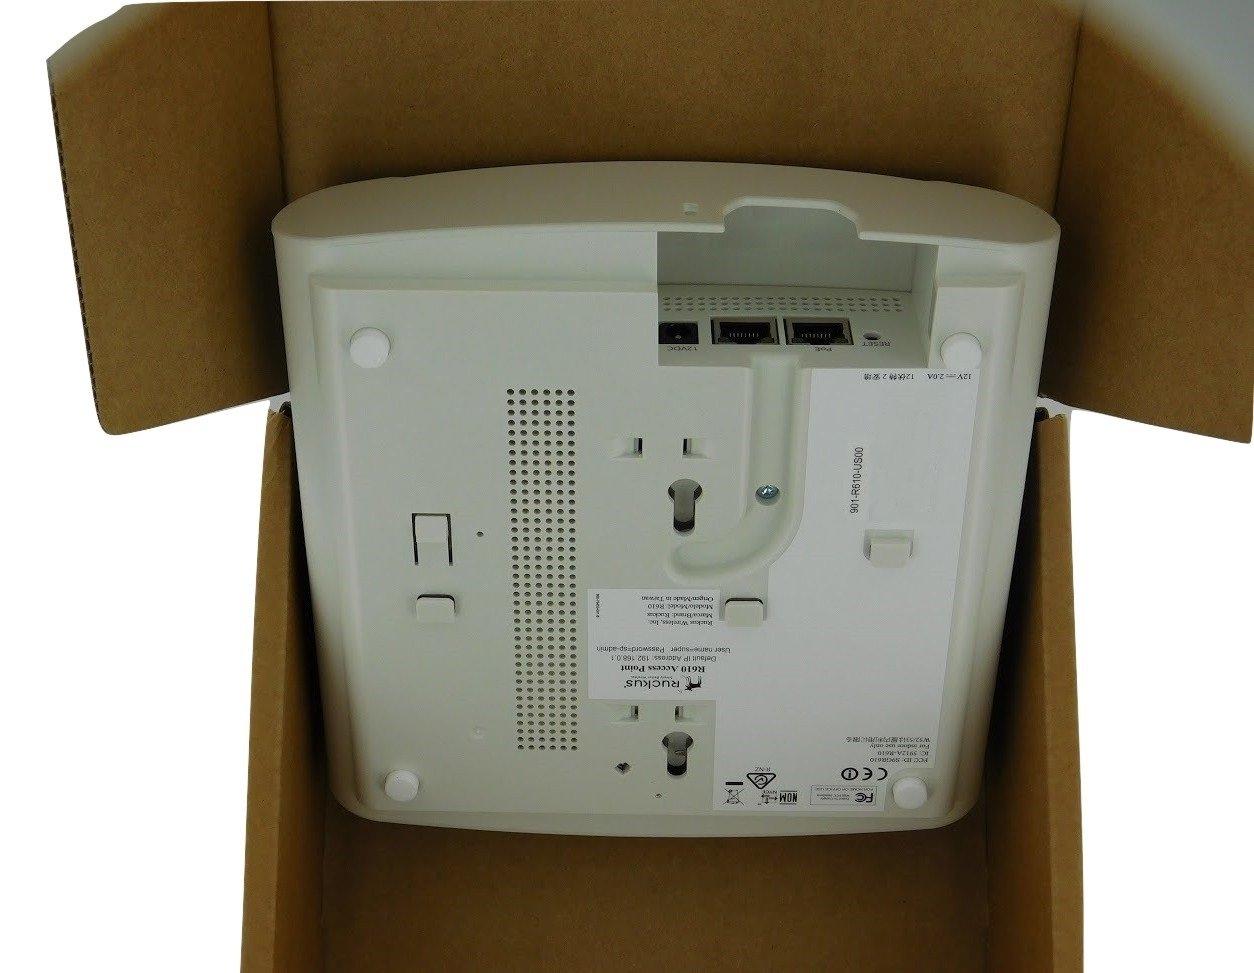 Ruckus Zoneflex R610 Wave 2 Access Point (Smart Wi-Fi 3x3, 802 11ac,  BeamFlex, Adaptive Antenna, POE) 901-R610-US00